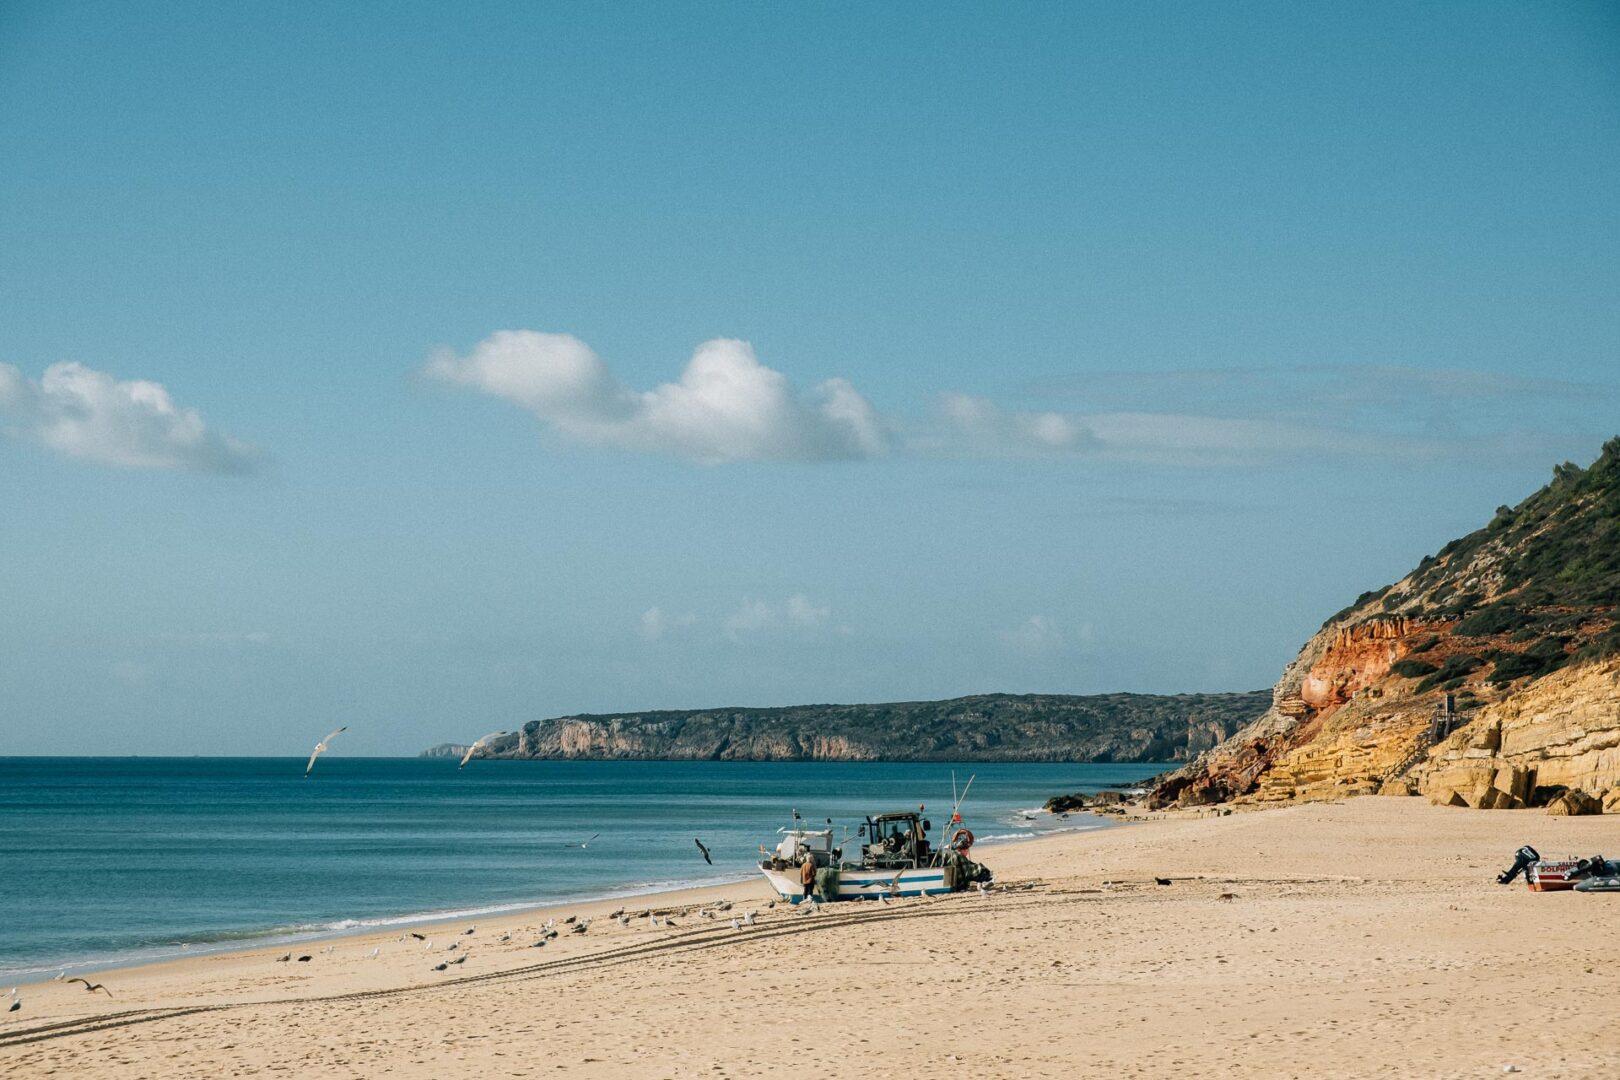 Praia da Salema en klar favorit